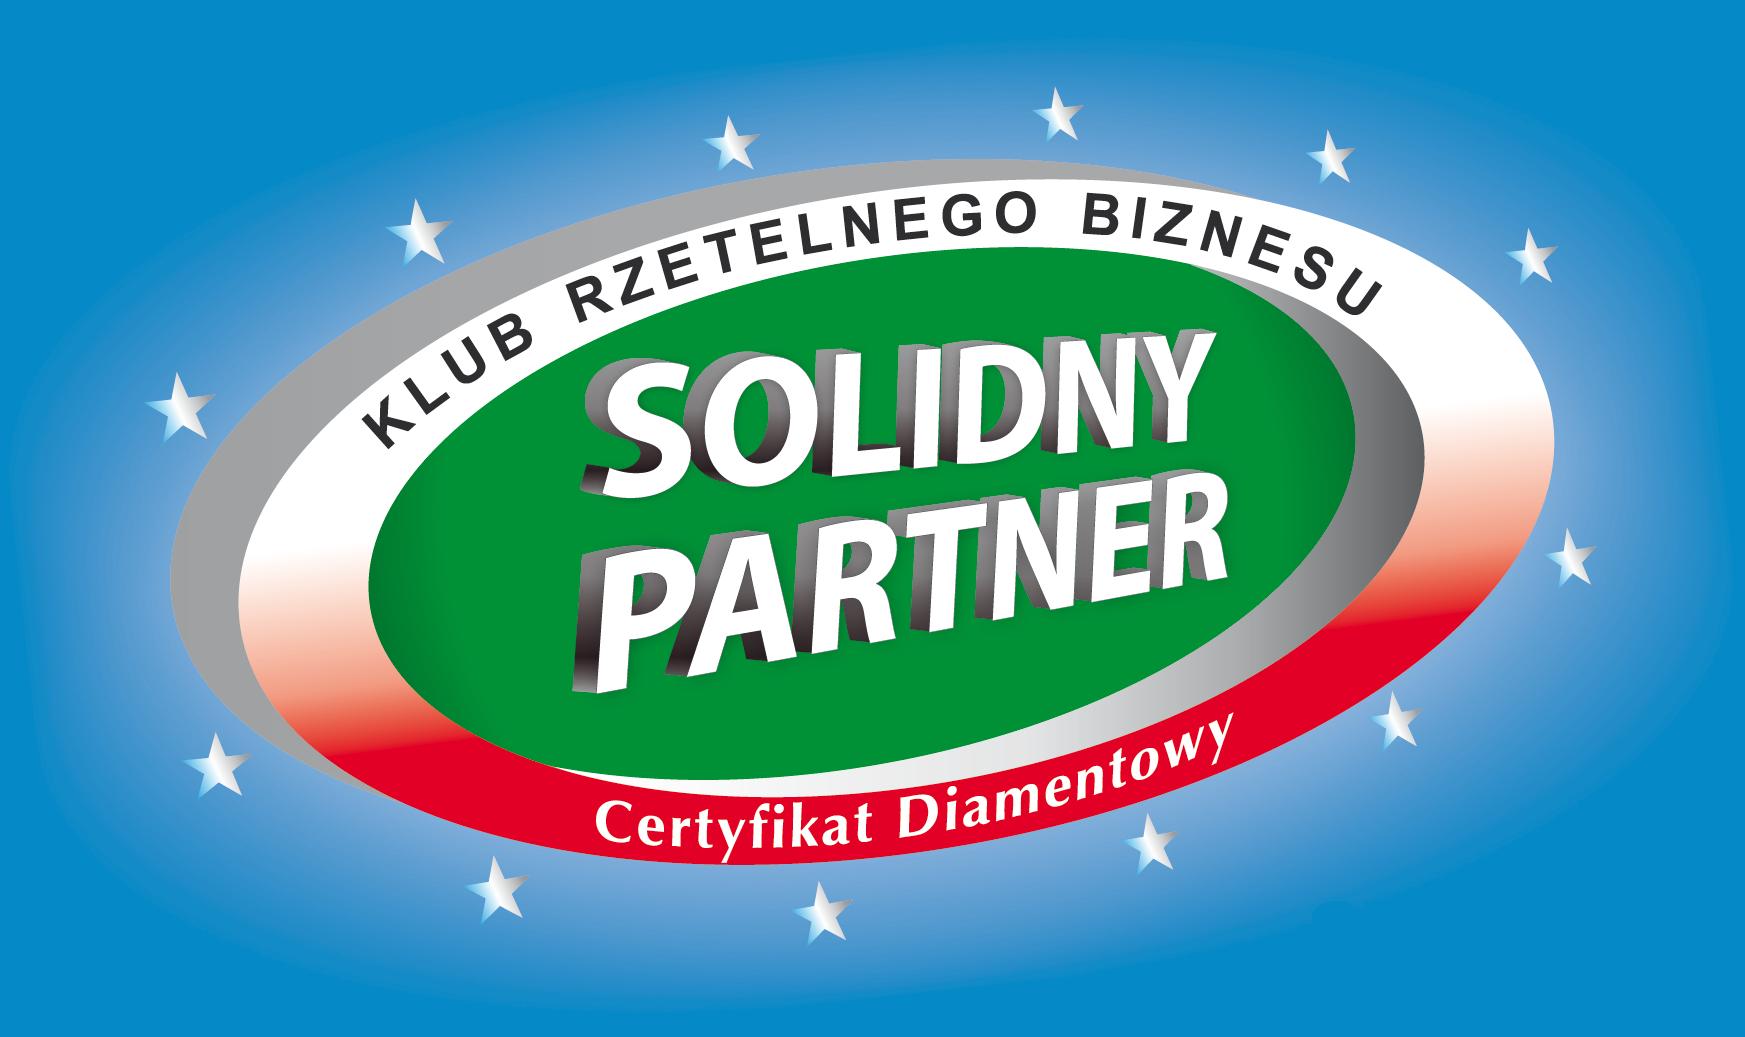 Certyfikat Diamentowy | Solidny Partner